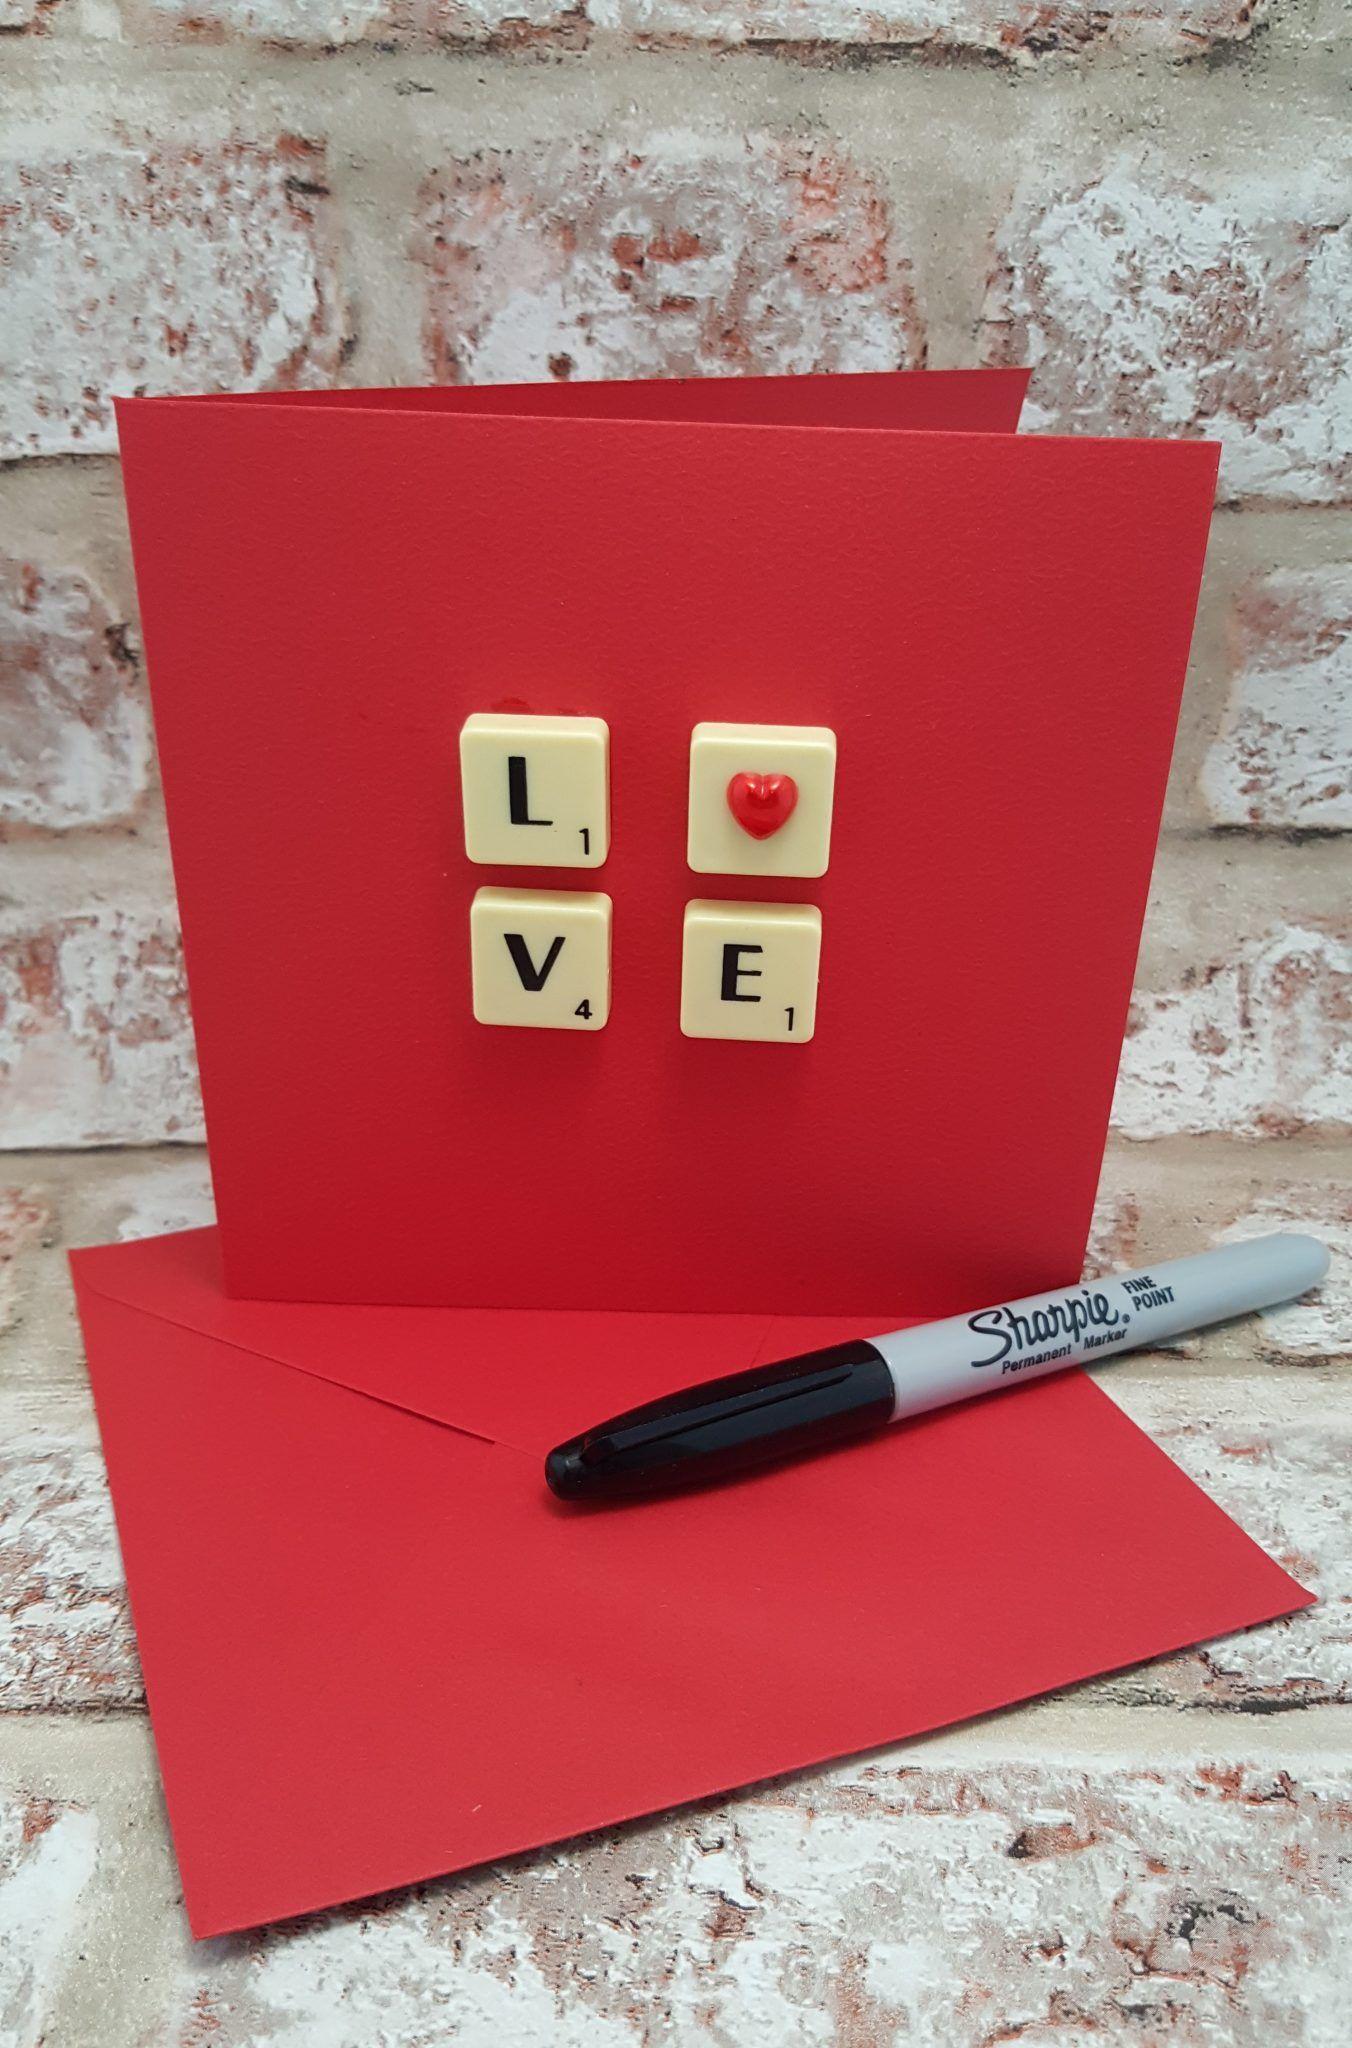 Love scrabble red valentine card girlfriend boyrfriend wife